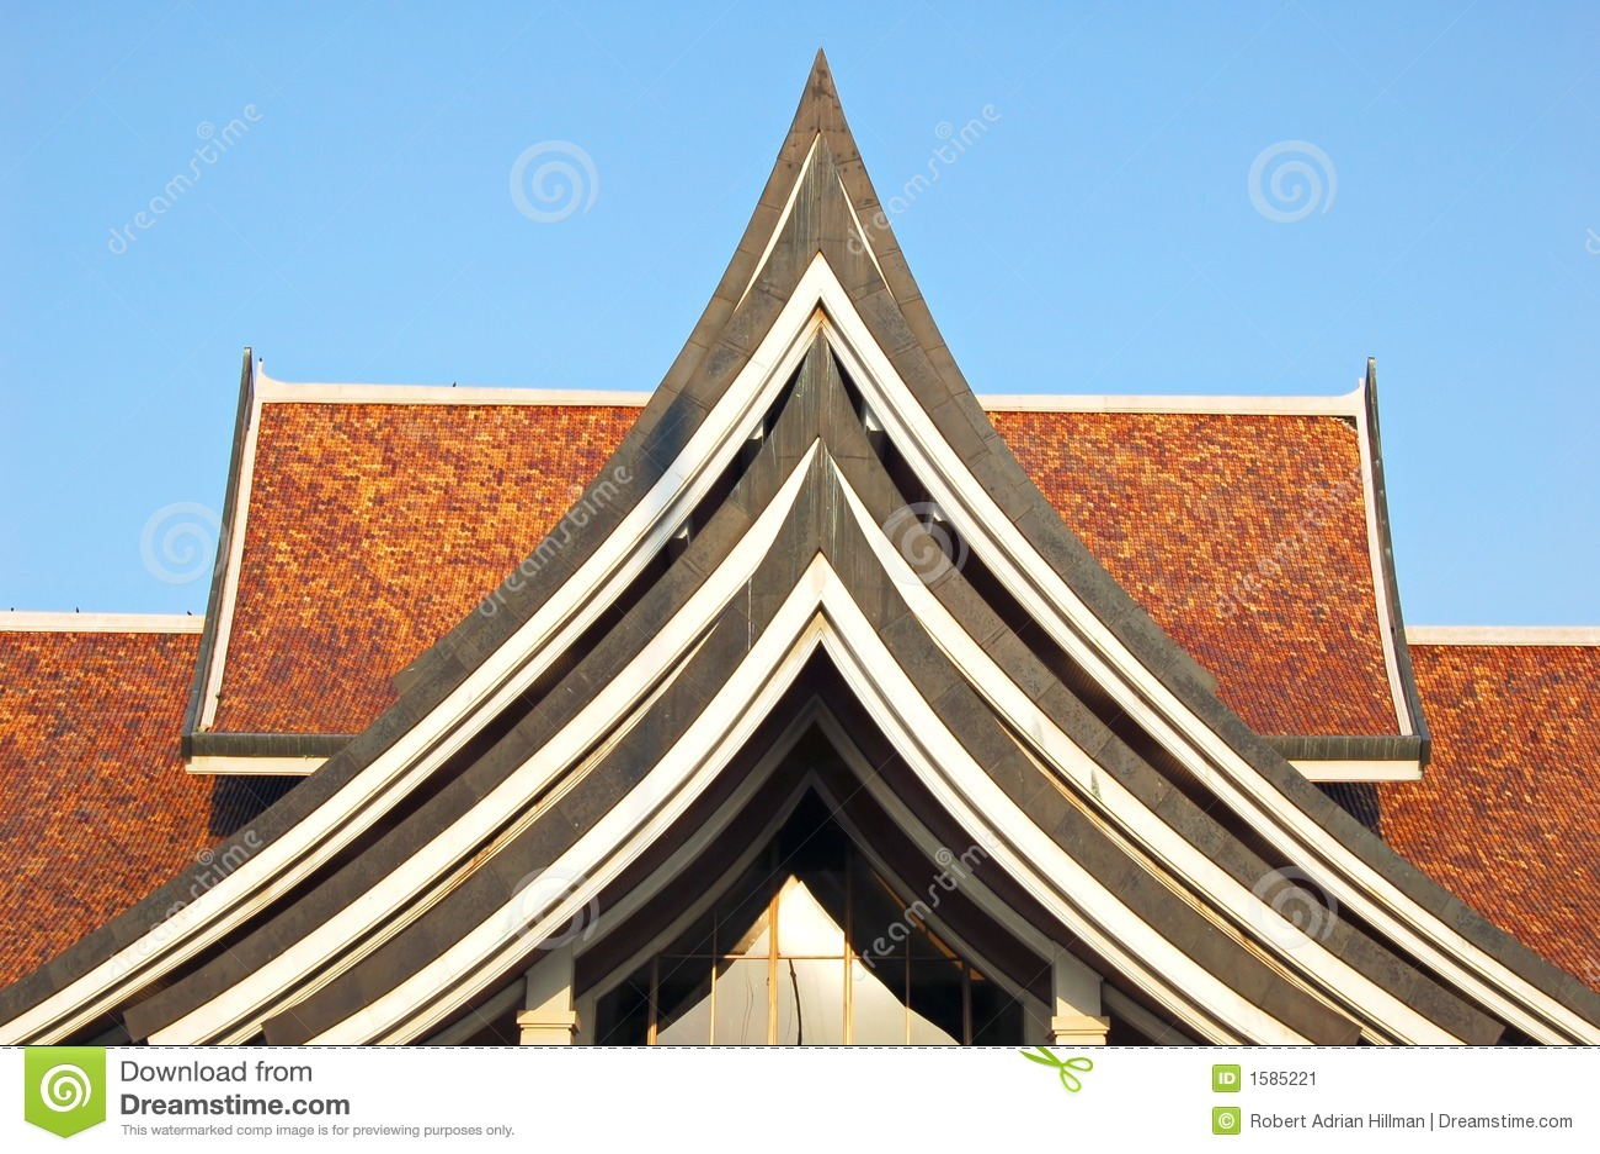 Thai architecture stock image image 1585221 for Thailand architecture